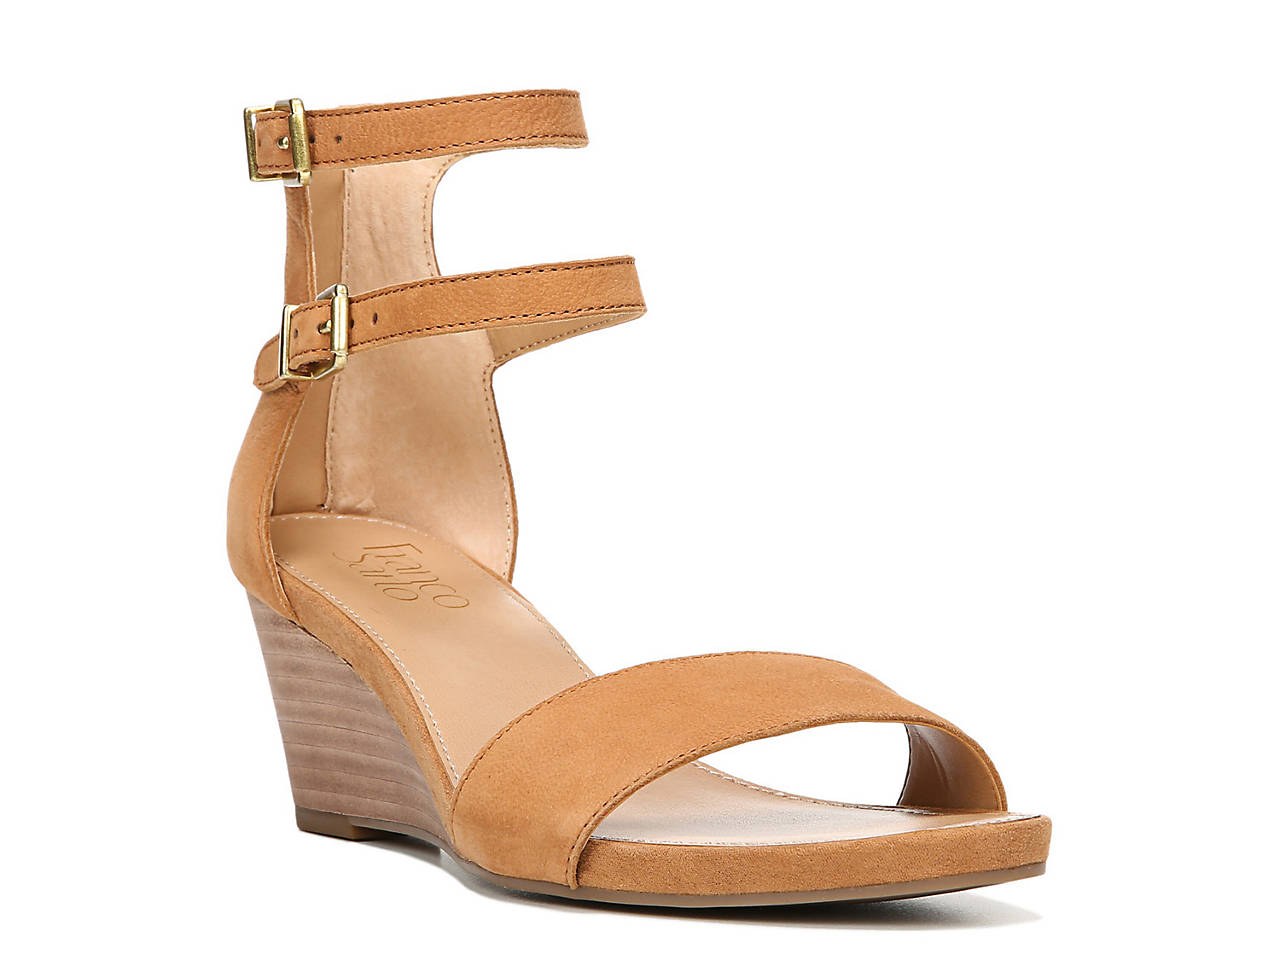 0007ef6064 Franco Sarto Dade Wedge Sandal Women s Shoes